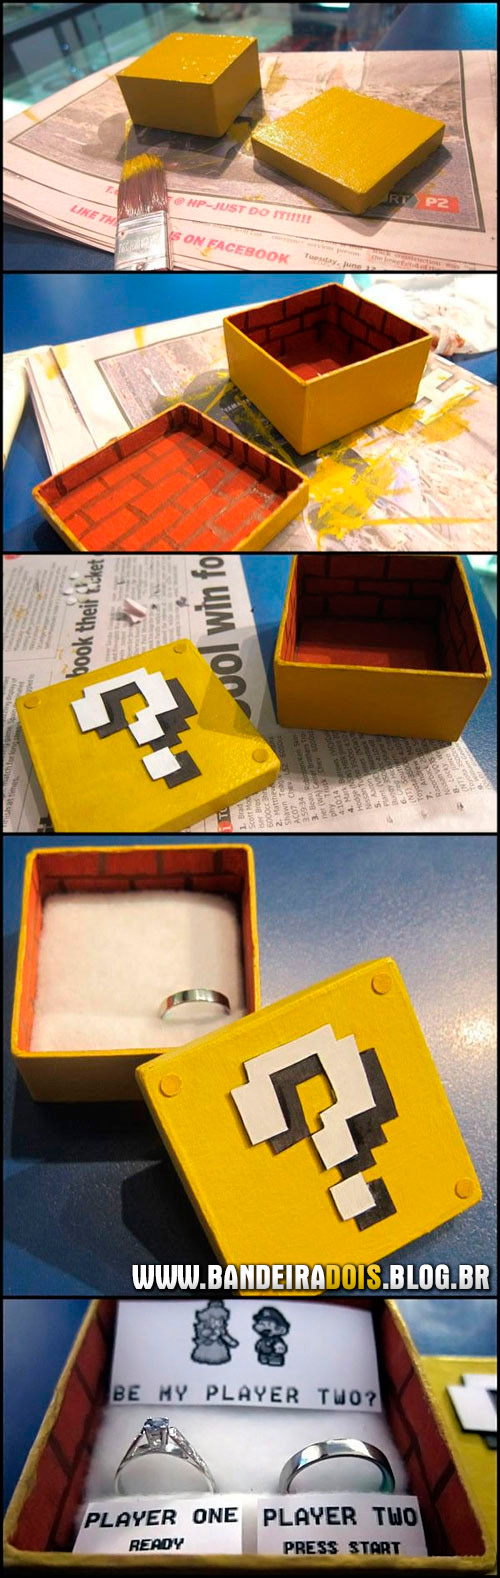 Casamento de nerd